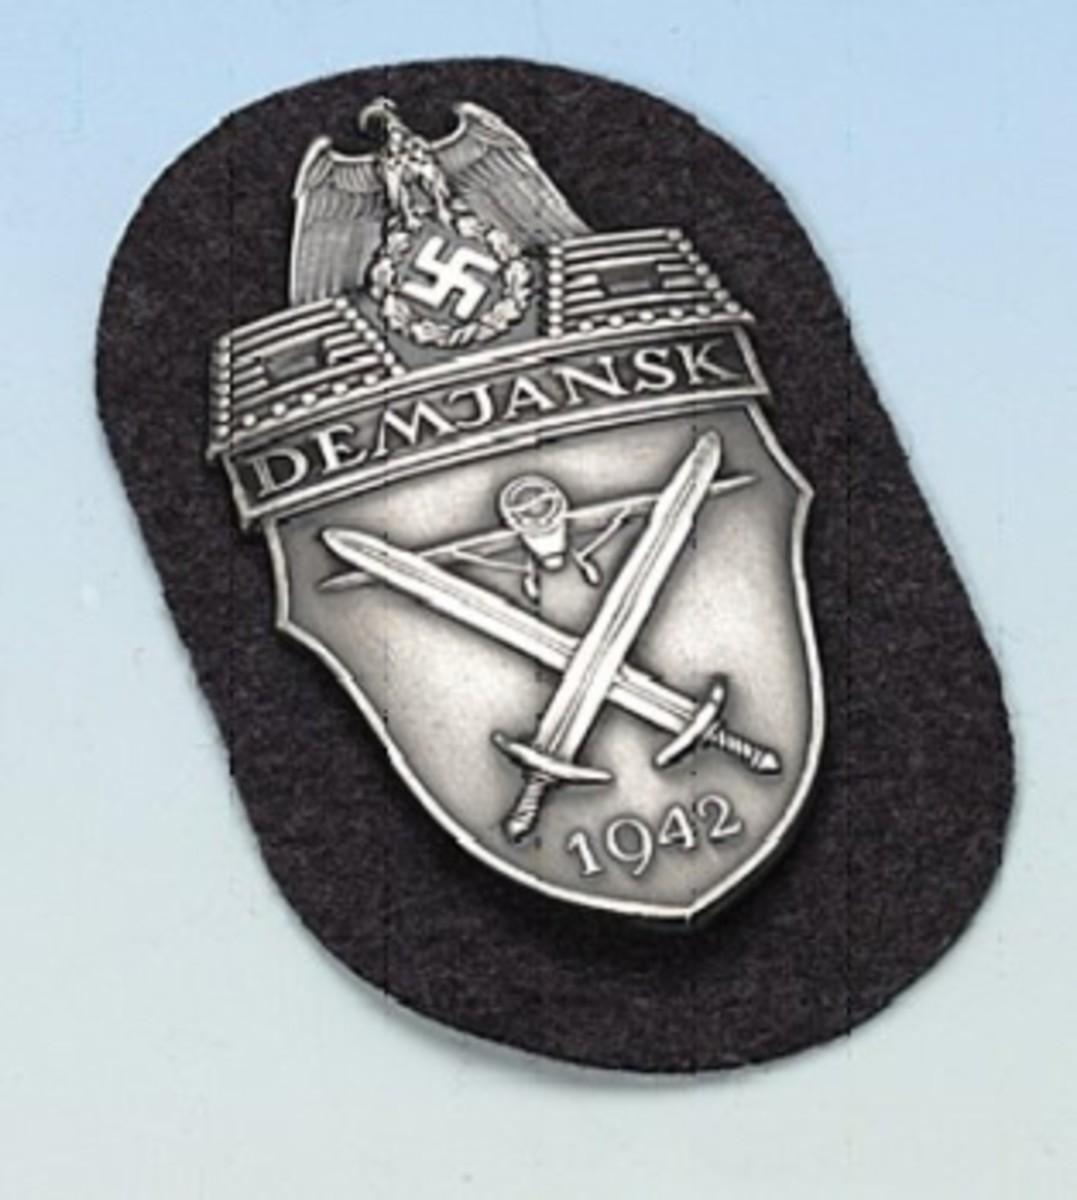 Demjanskschild (Demjansk Shield)